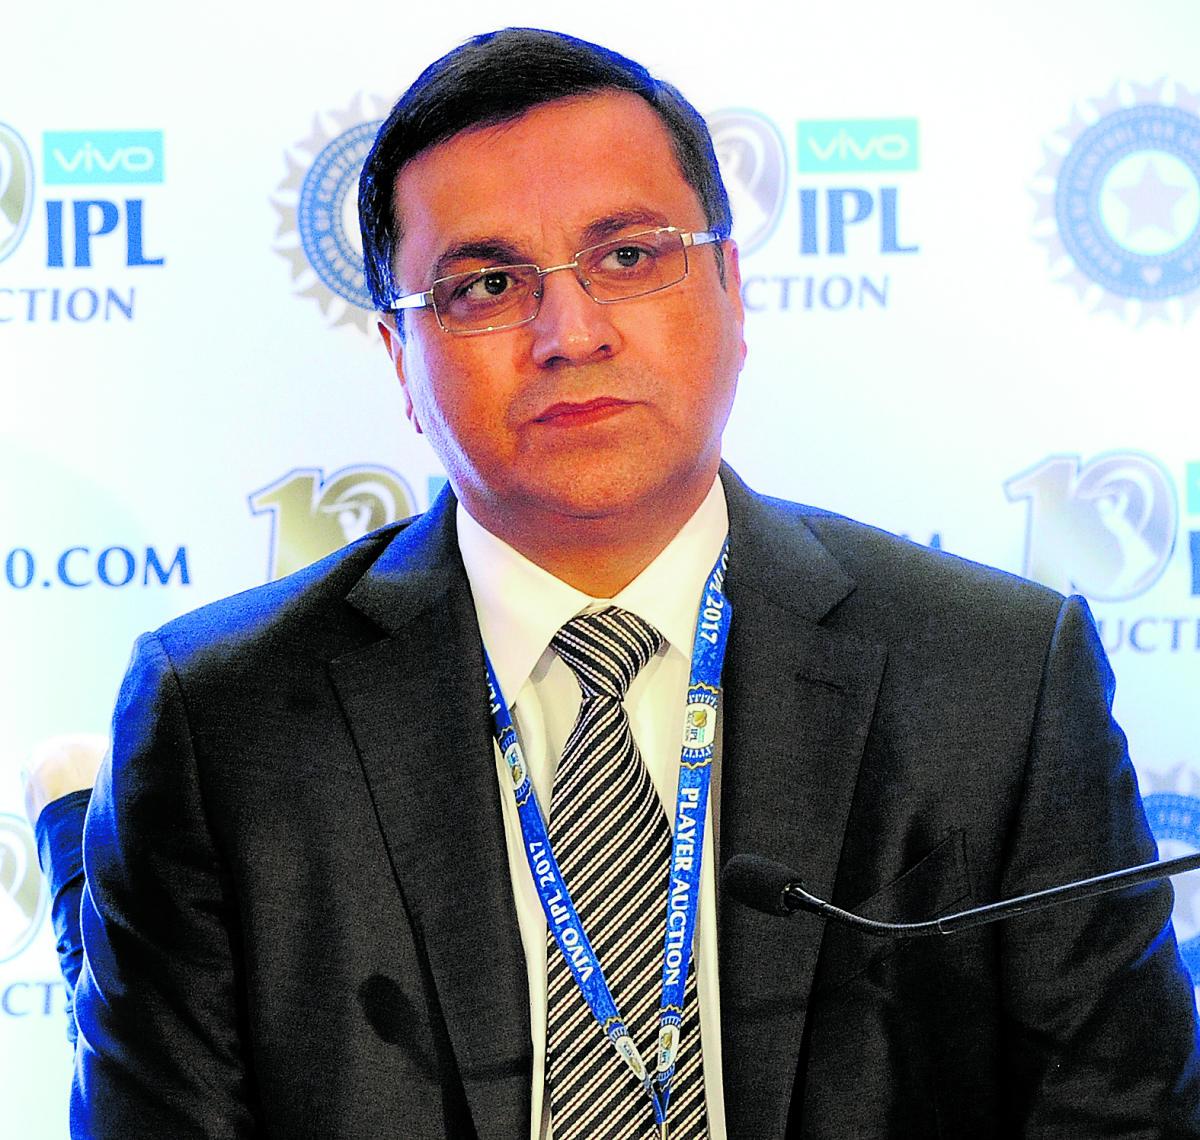 BCCI CEO Rahul Johri during the IPL auction in Bengaluru. DH FILE PHOTO/Srikanta Sharma R